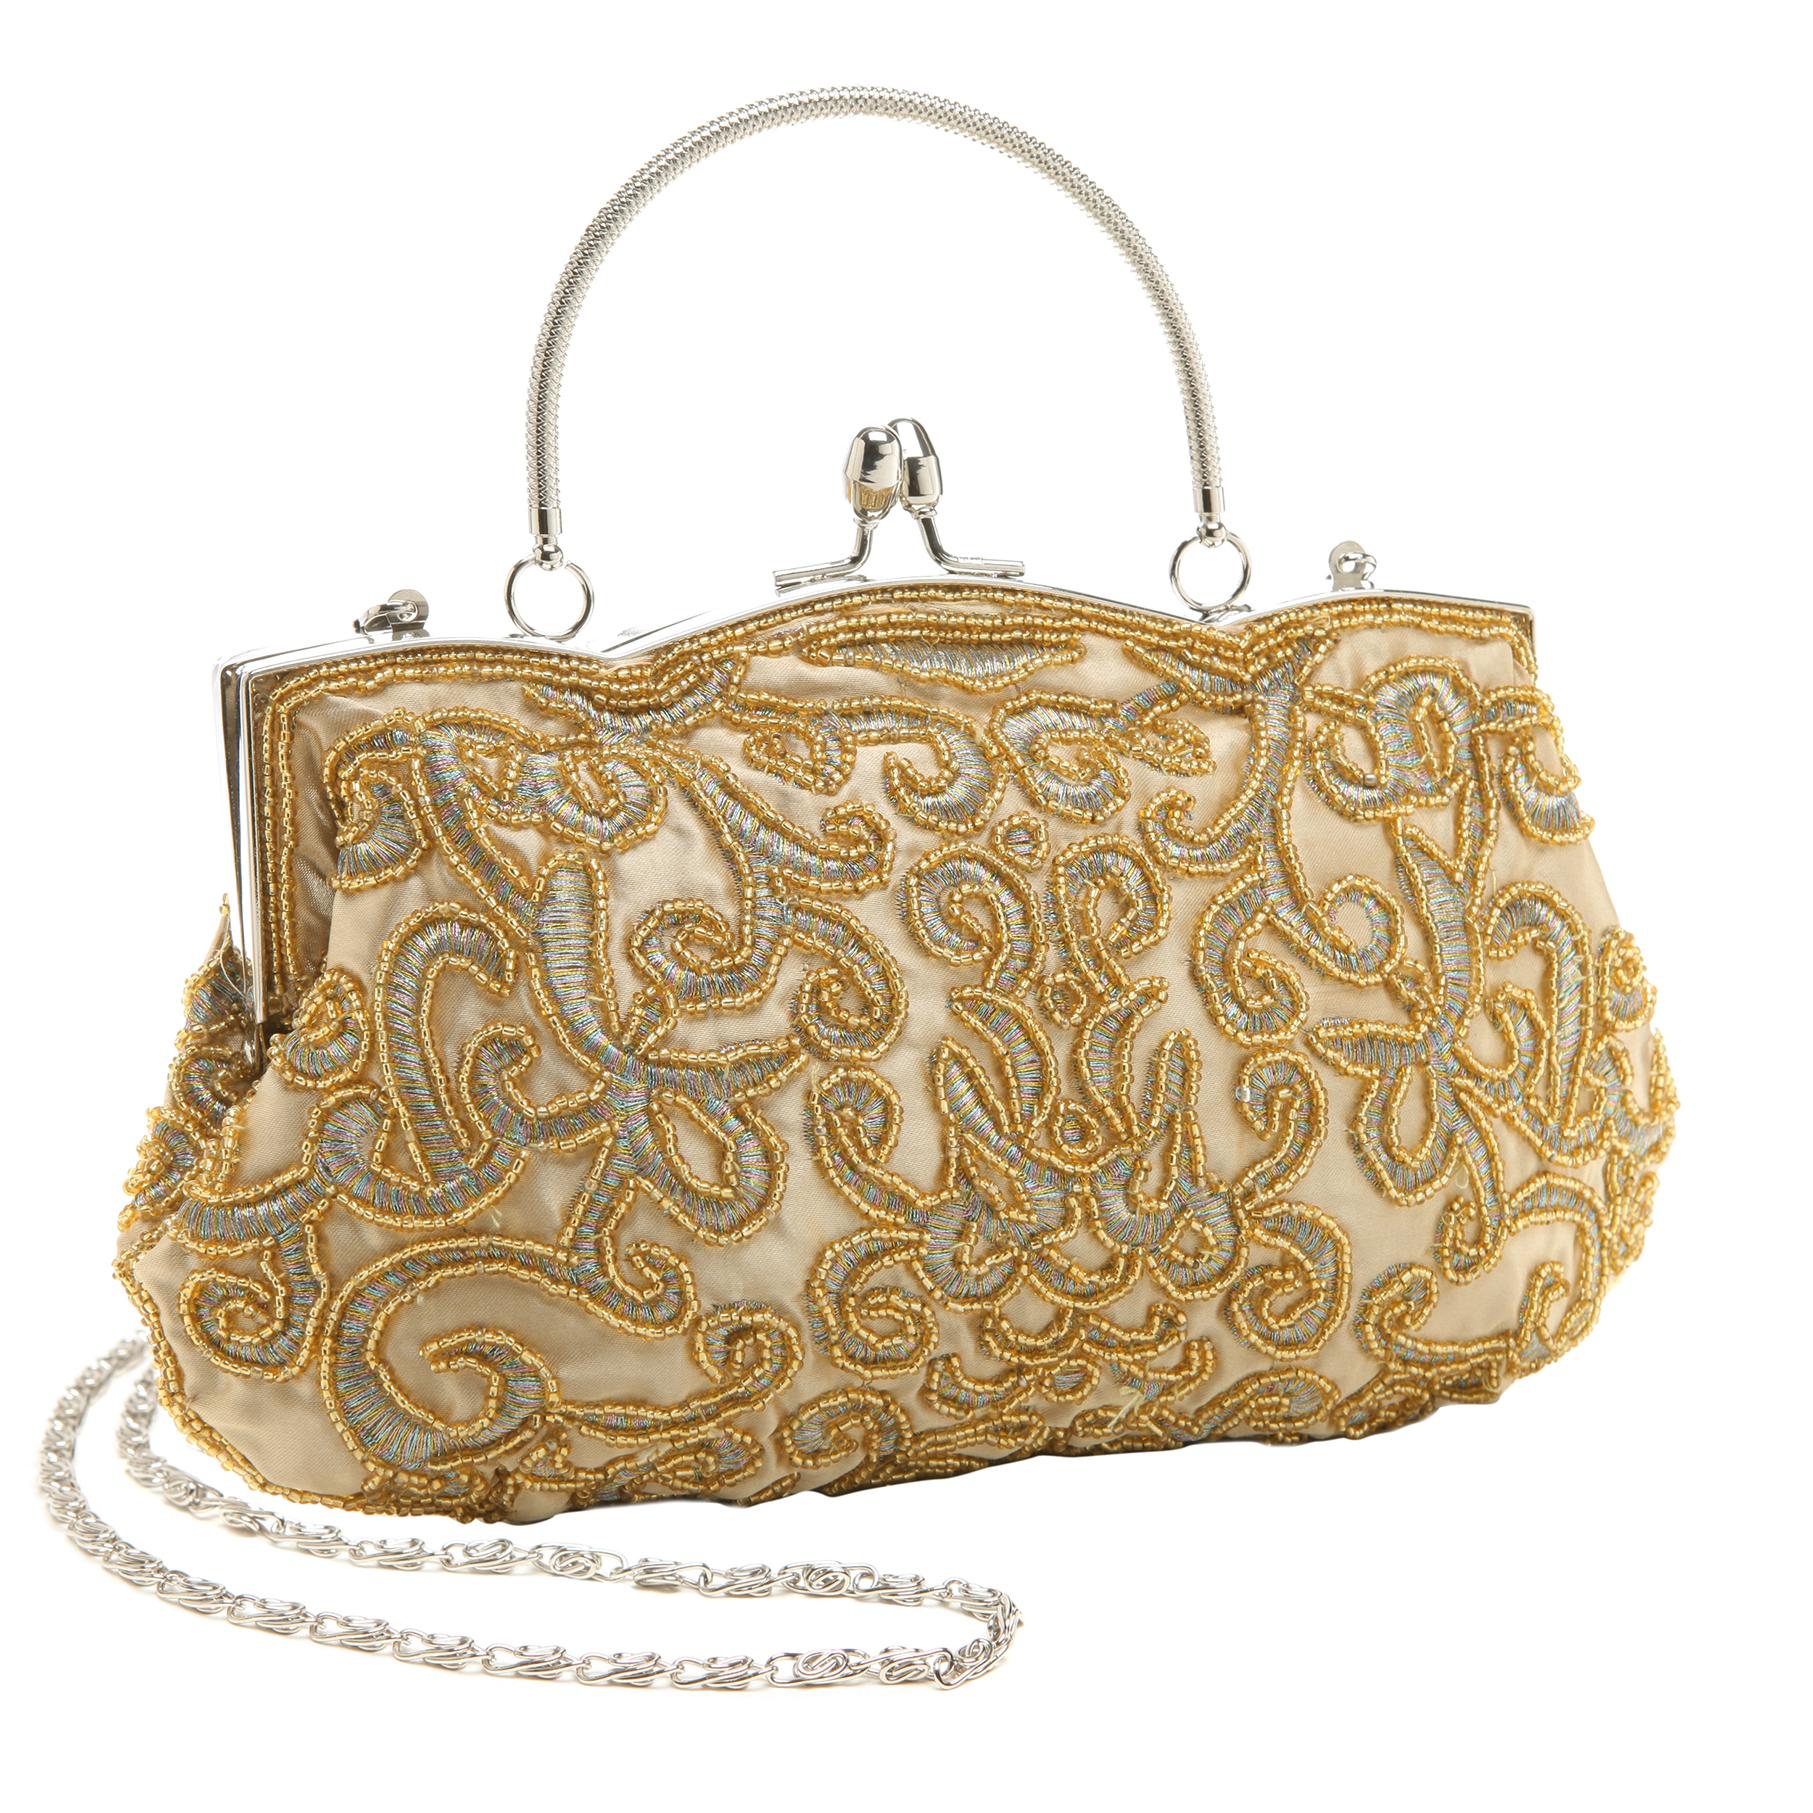 ADELE Gold Embroidered Evening Handbag main